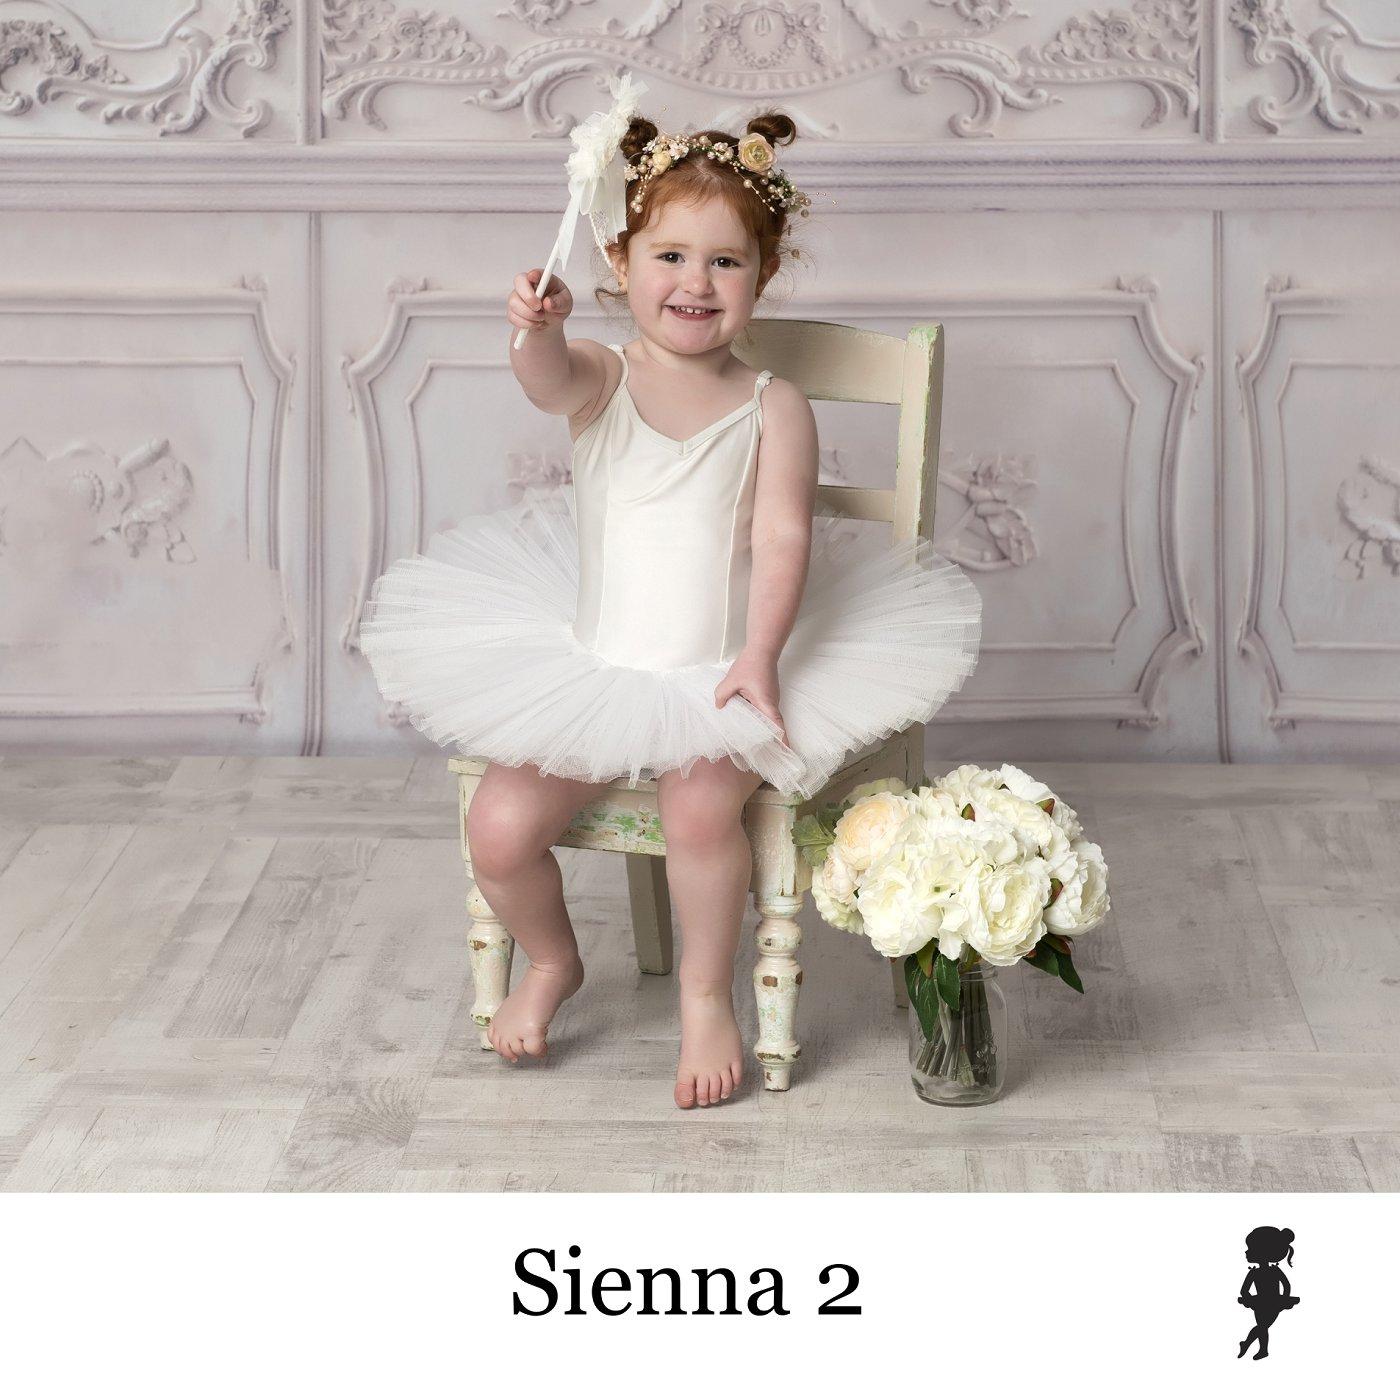 LB15219- Sienna 2.jpg